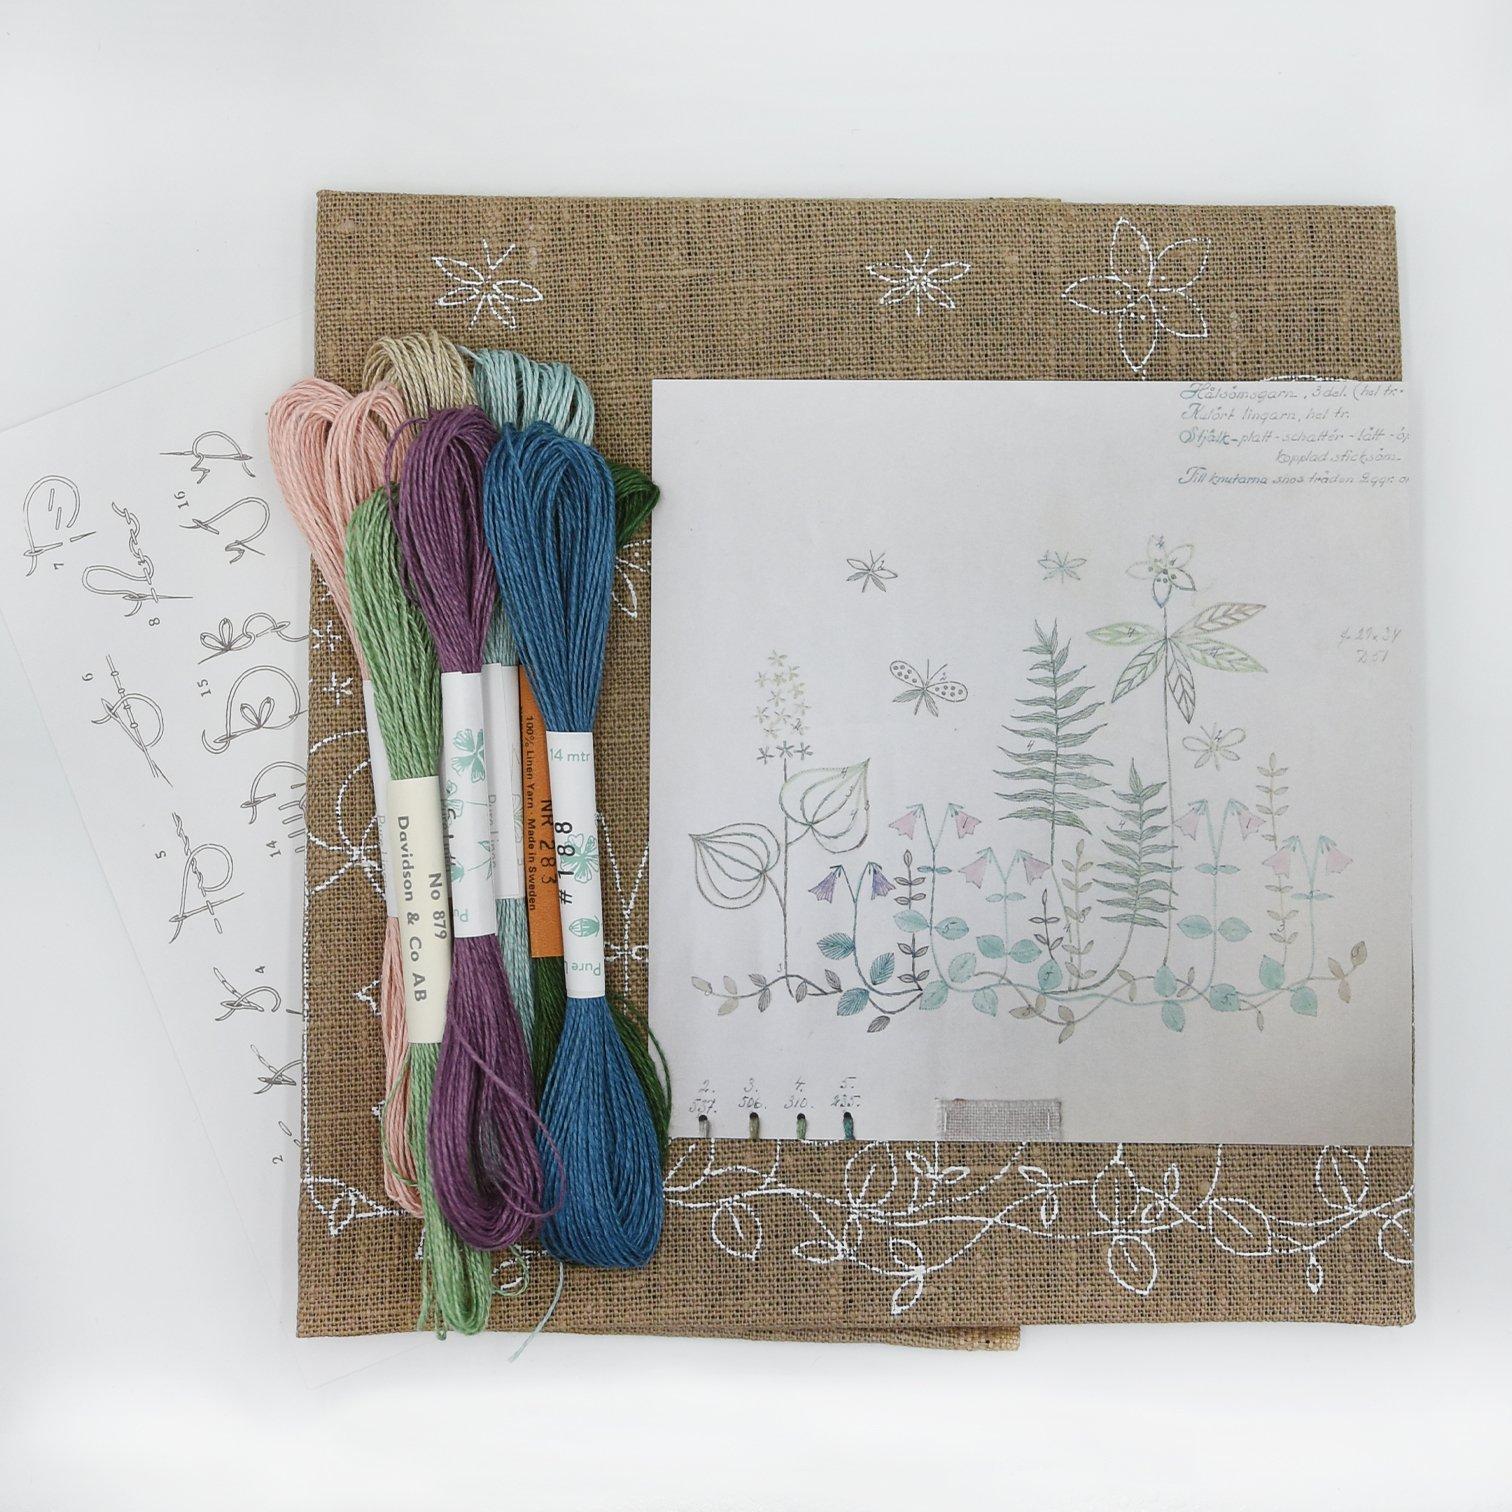 Linladan - Linneaus - Swedish Embroidery Kit 5